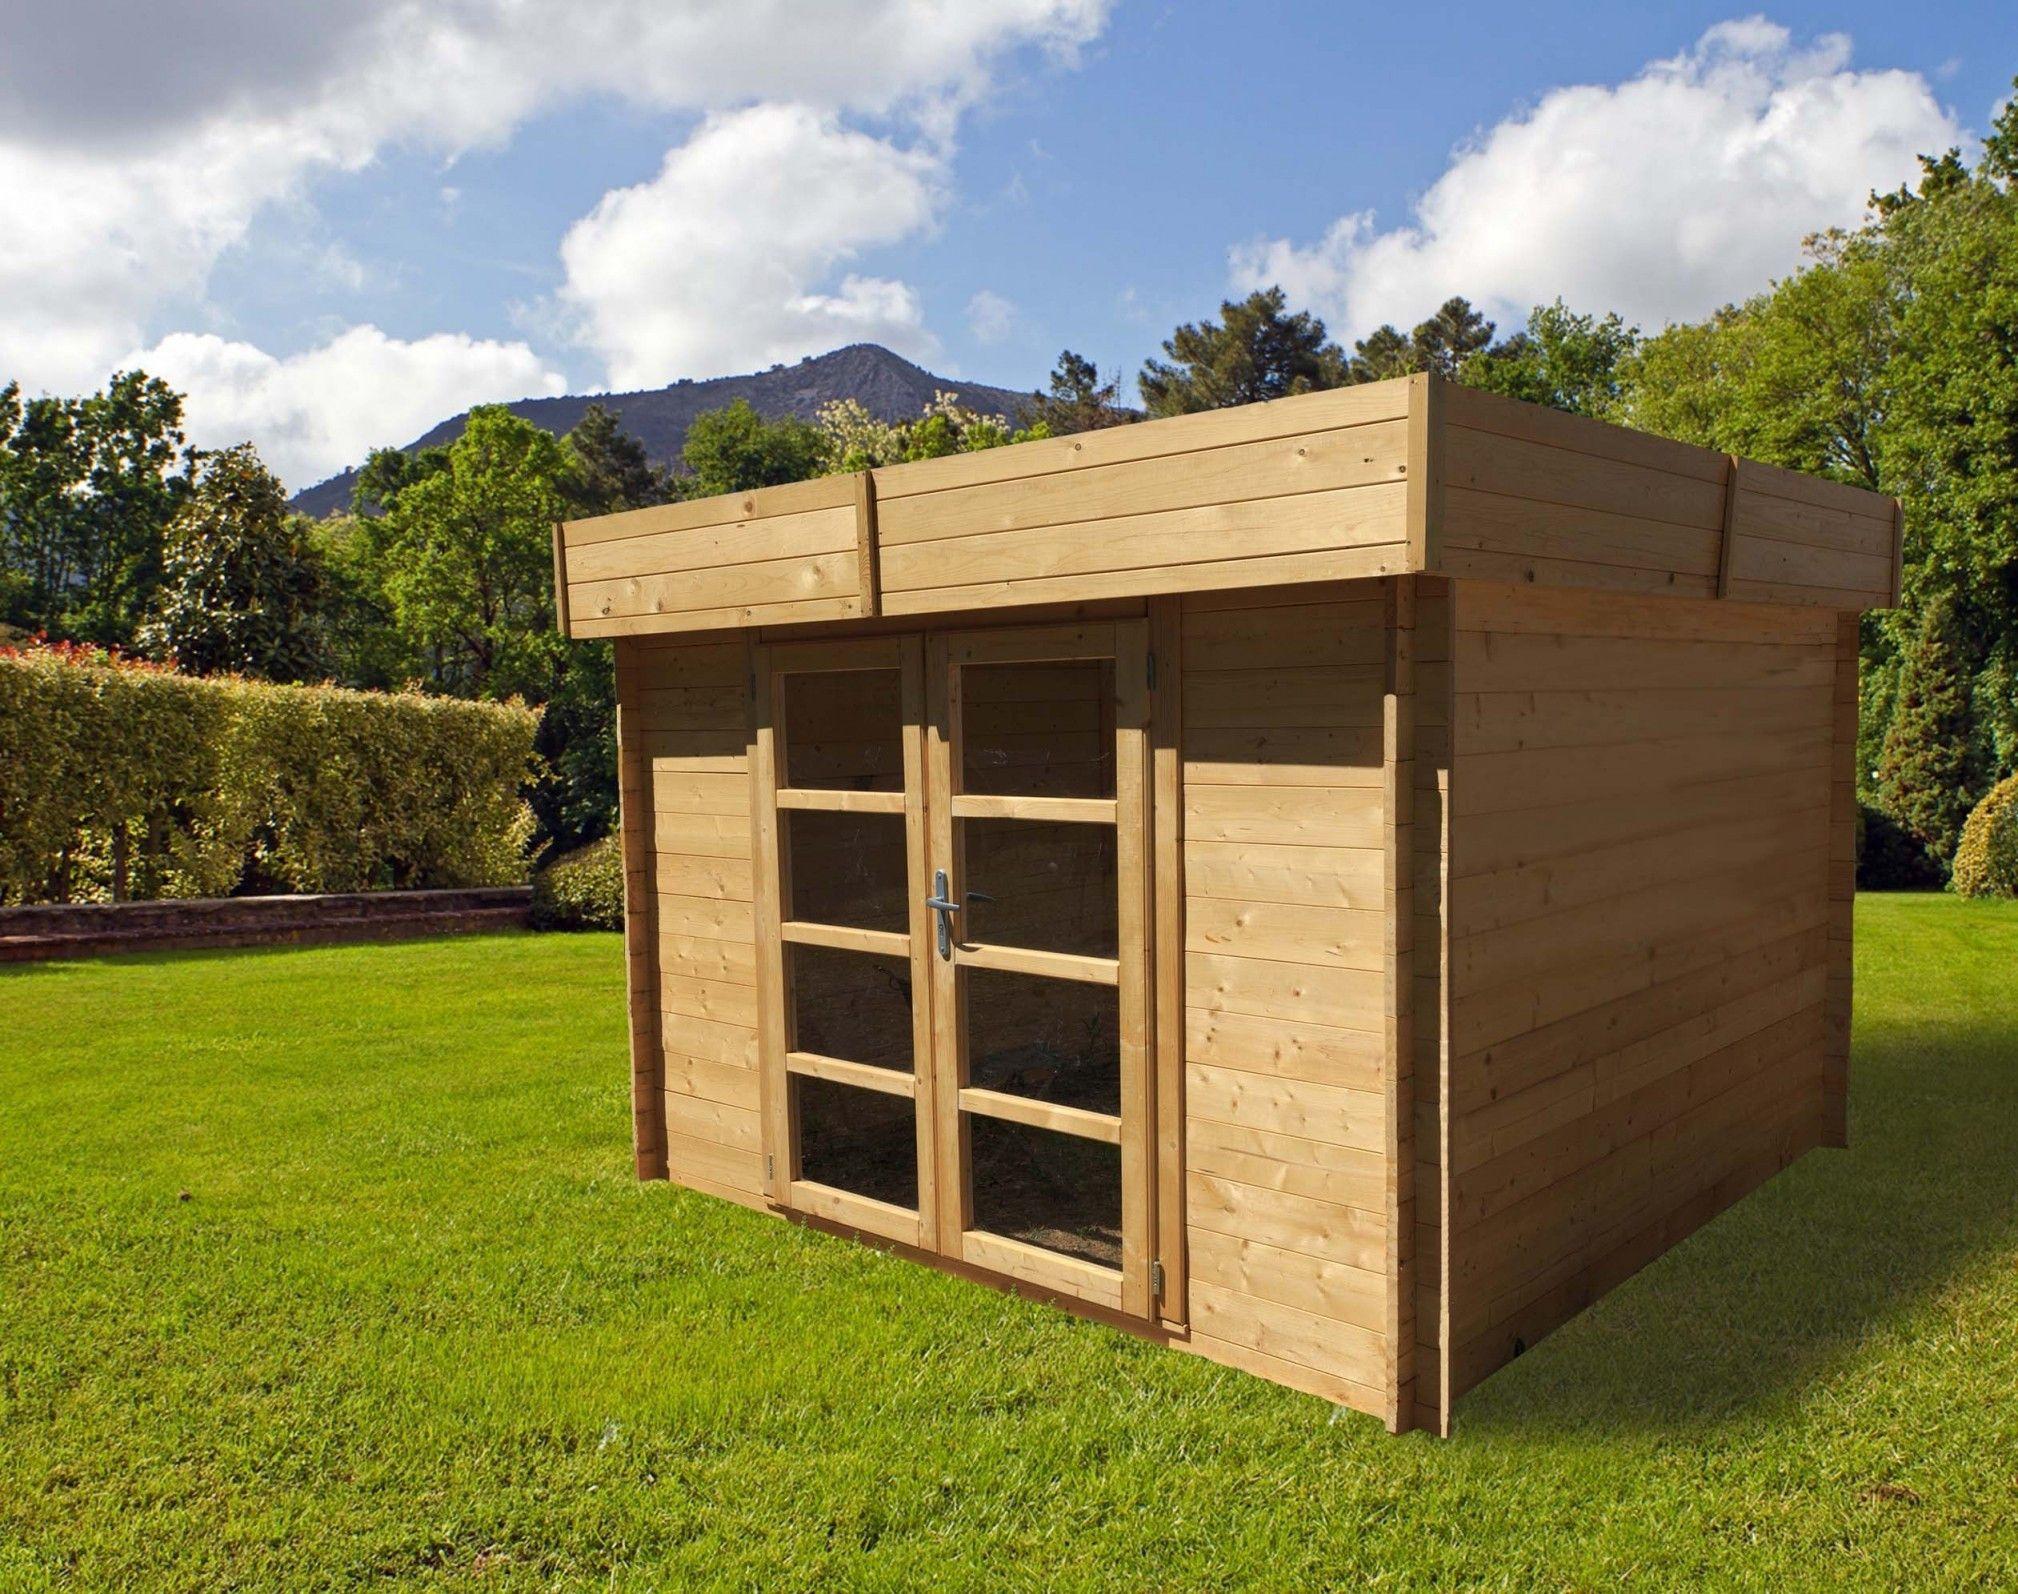 Abri Moto Bois Abri Moto Bois - Idees Conception Jardin concernant Abri Moto Jardin